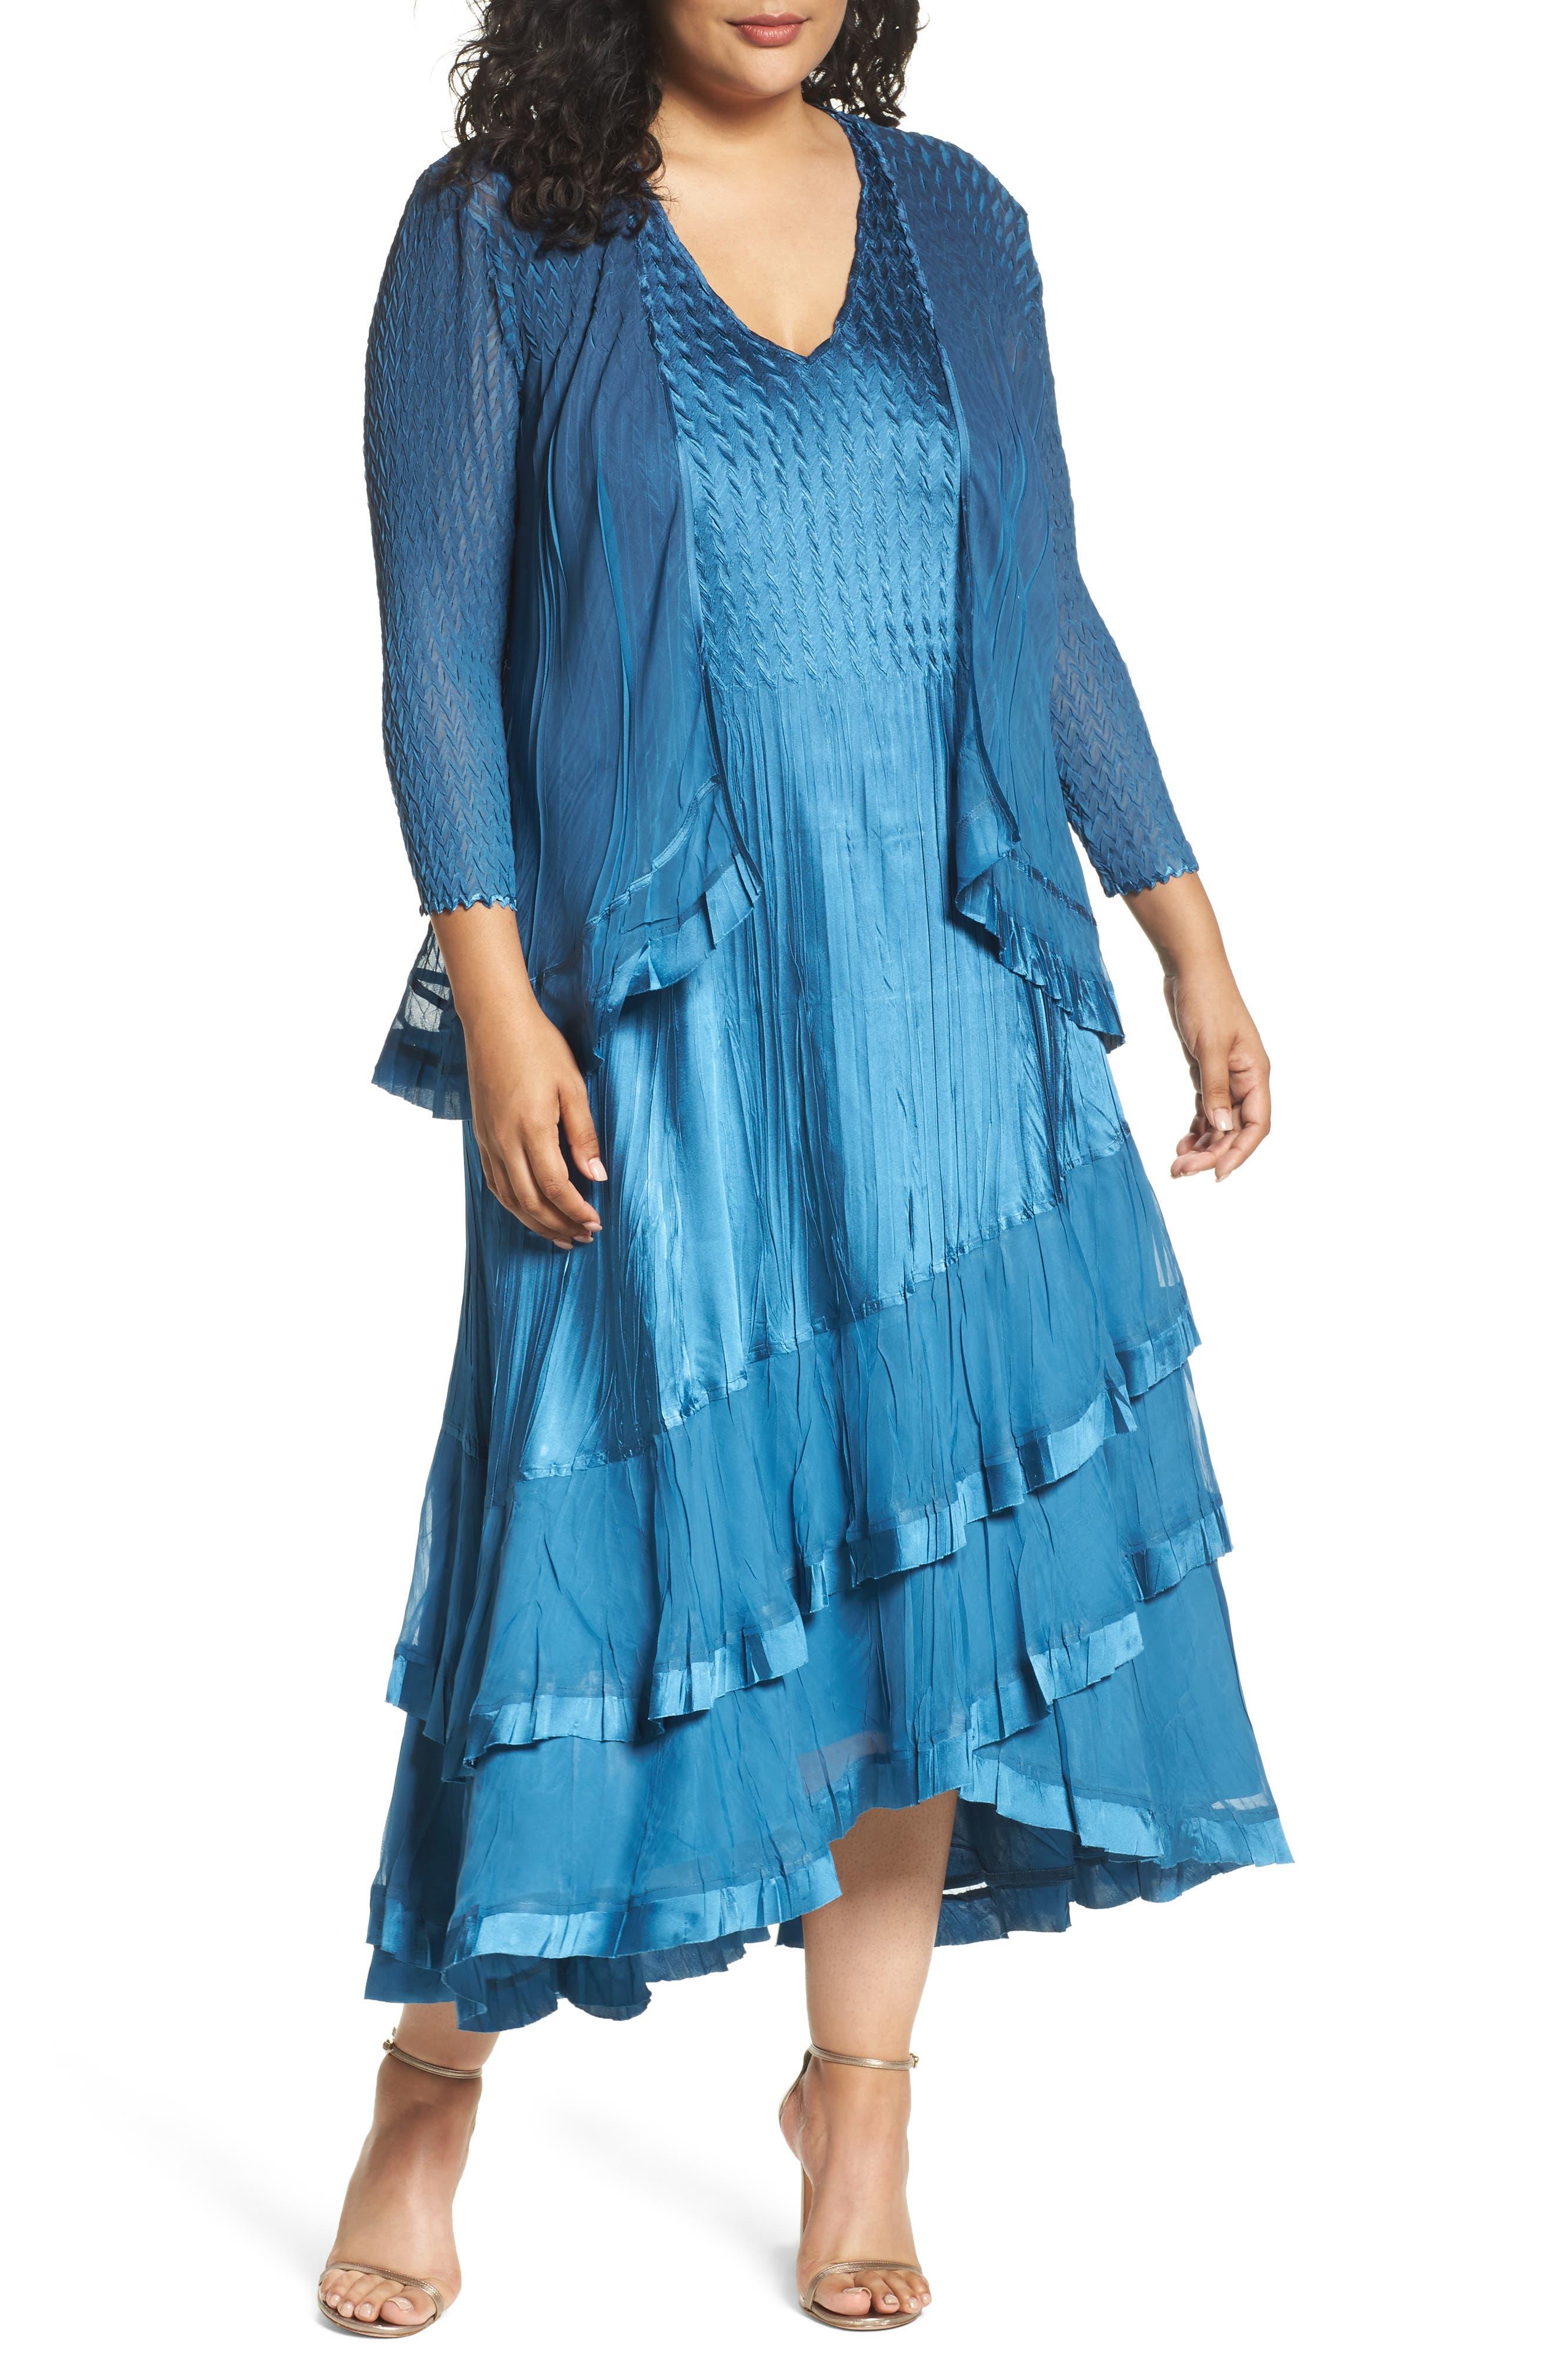 Main Image - Komarov Tiered Dress with Jacket (Plus Size)